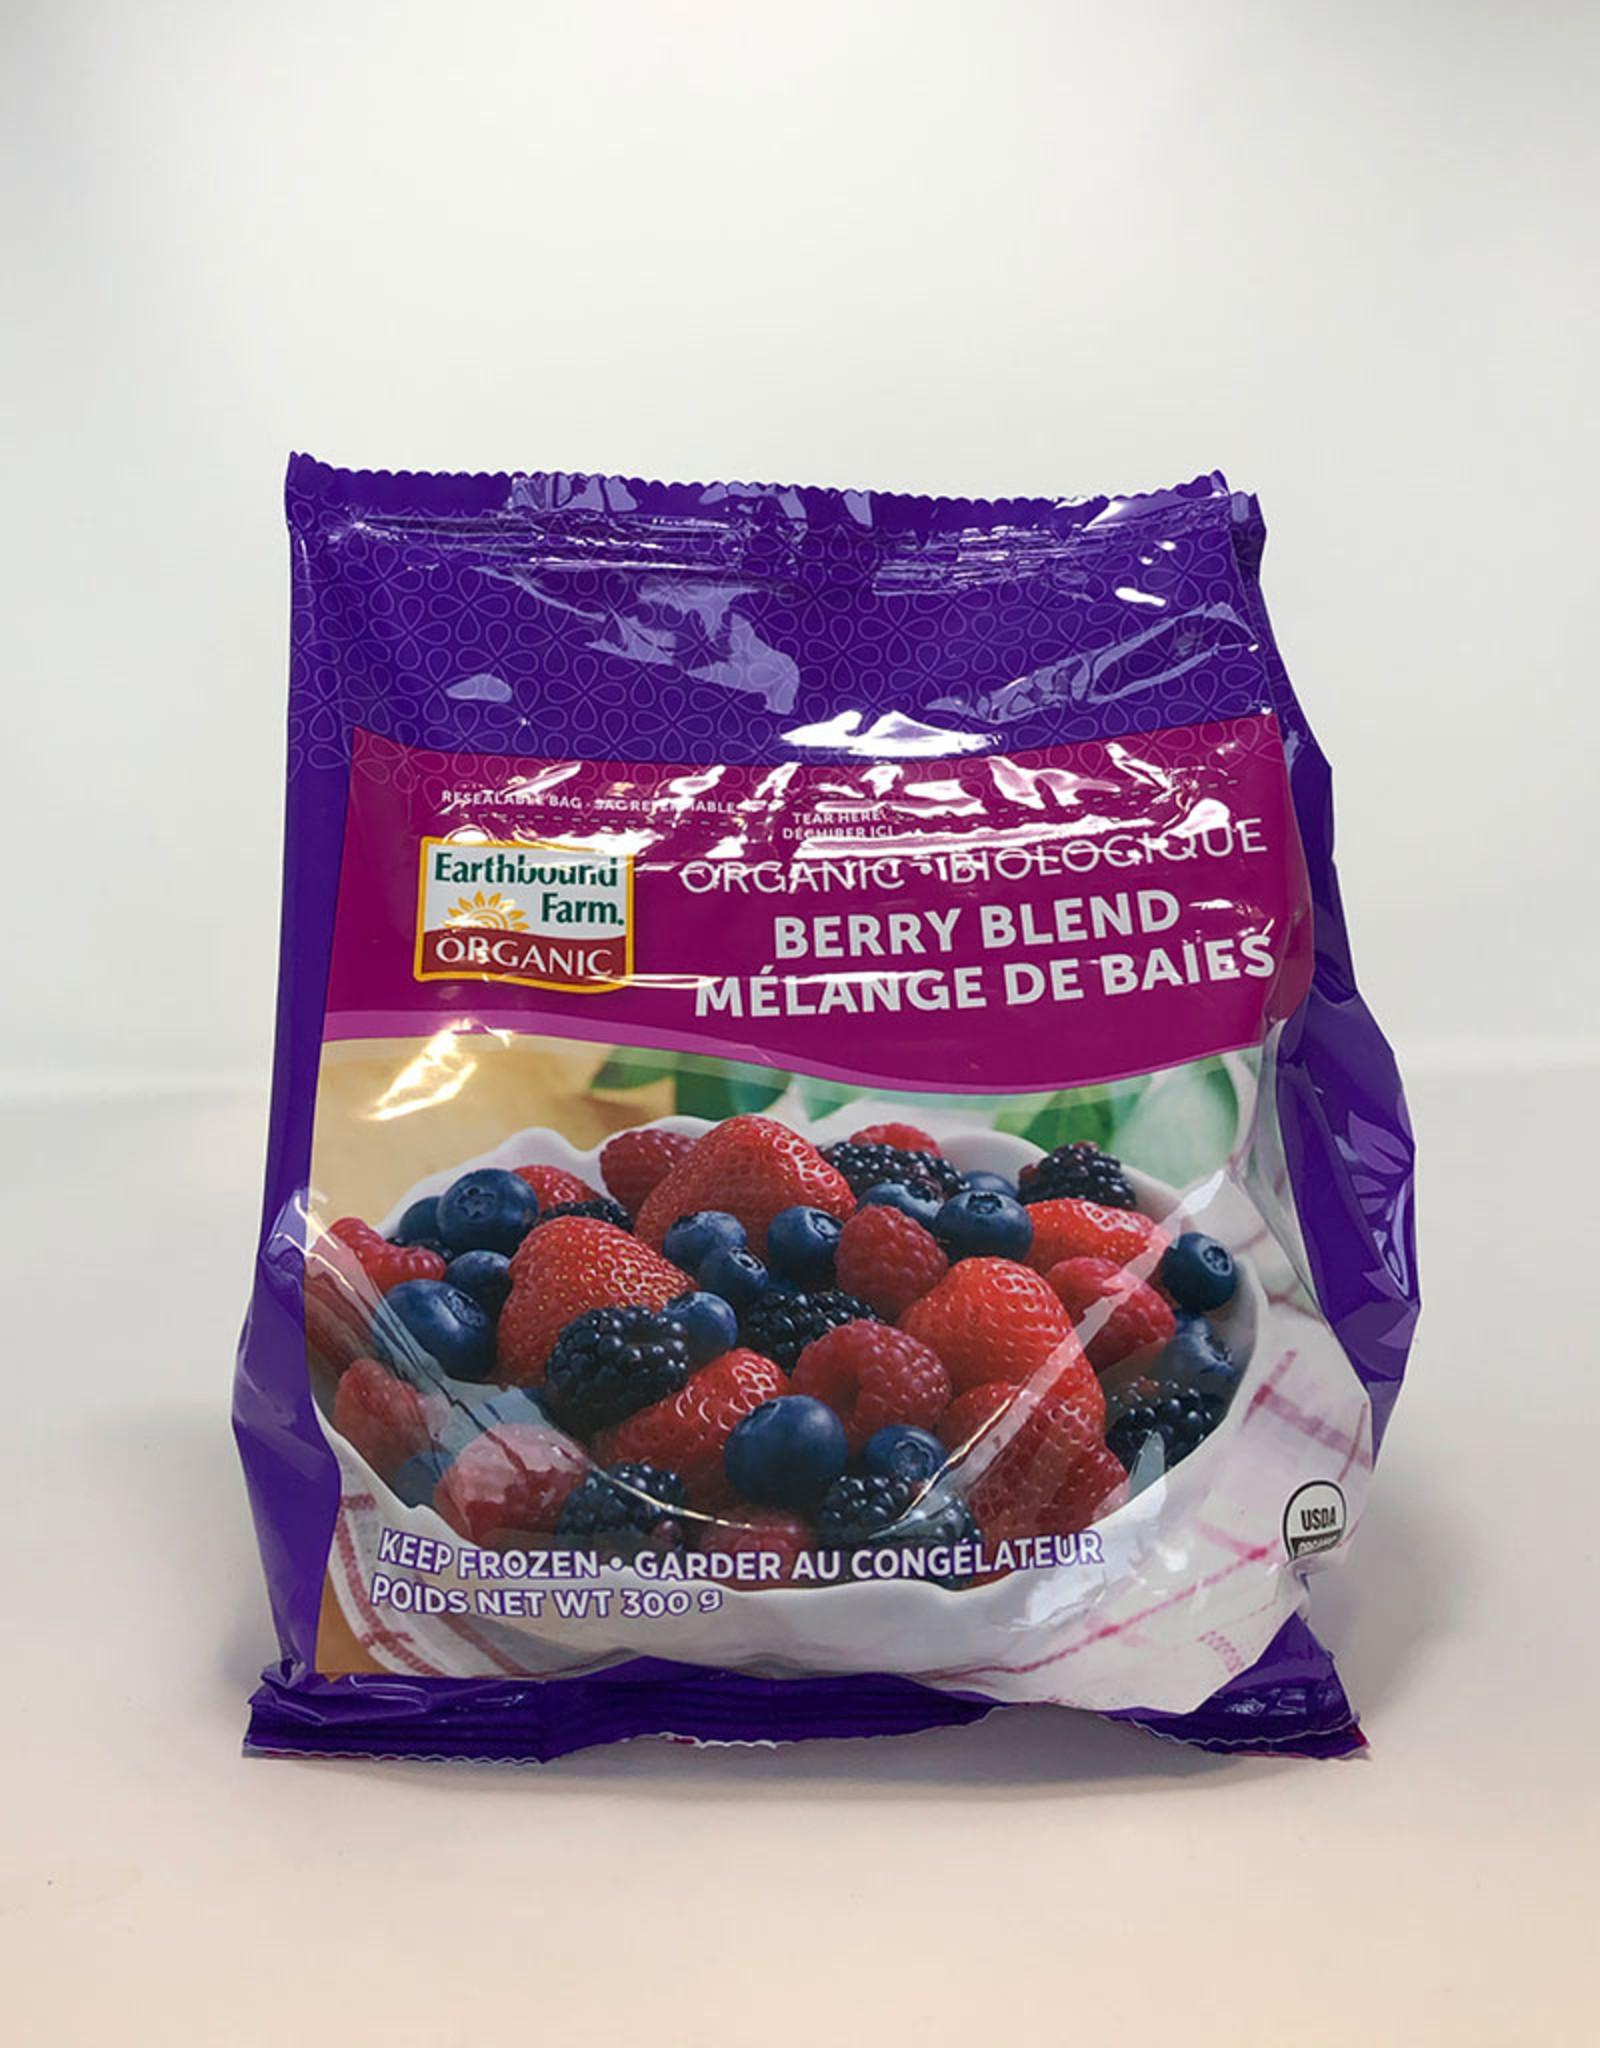 Earthbound Farm Earthbound Farm - Frozen Fruits, Organic Berry Blend (300g)